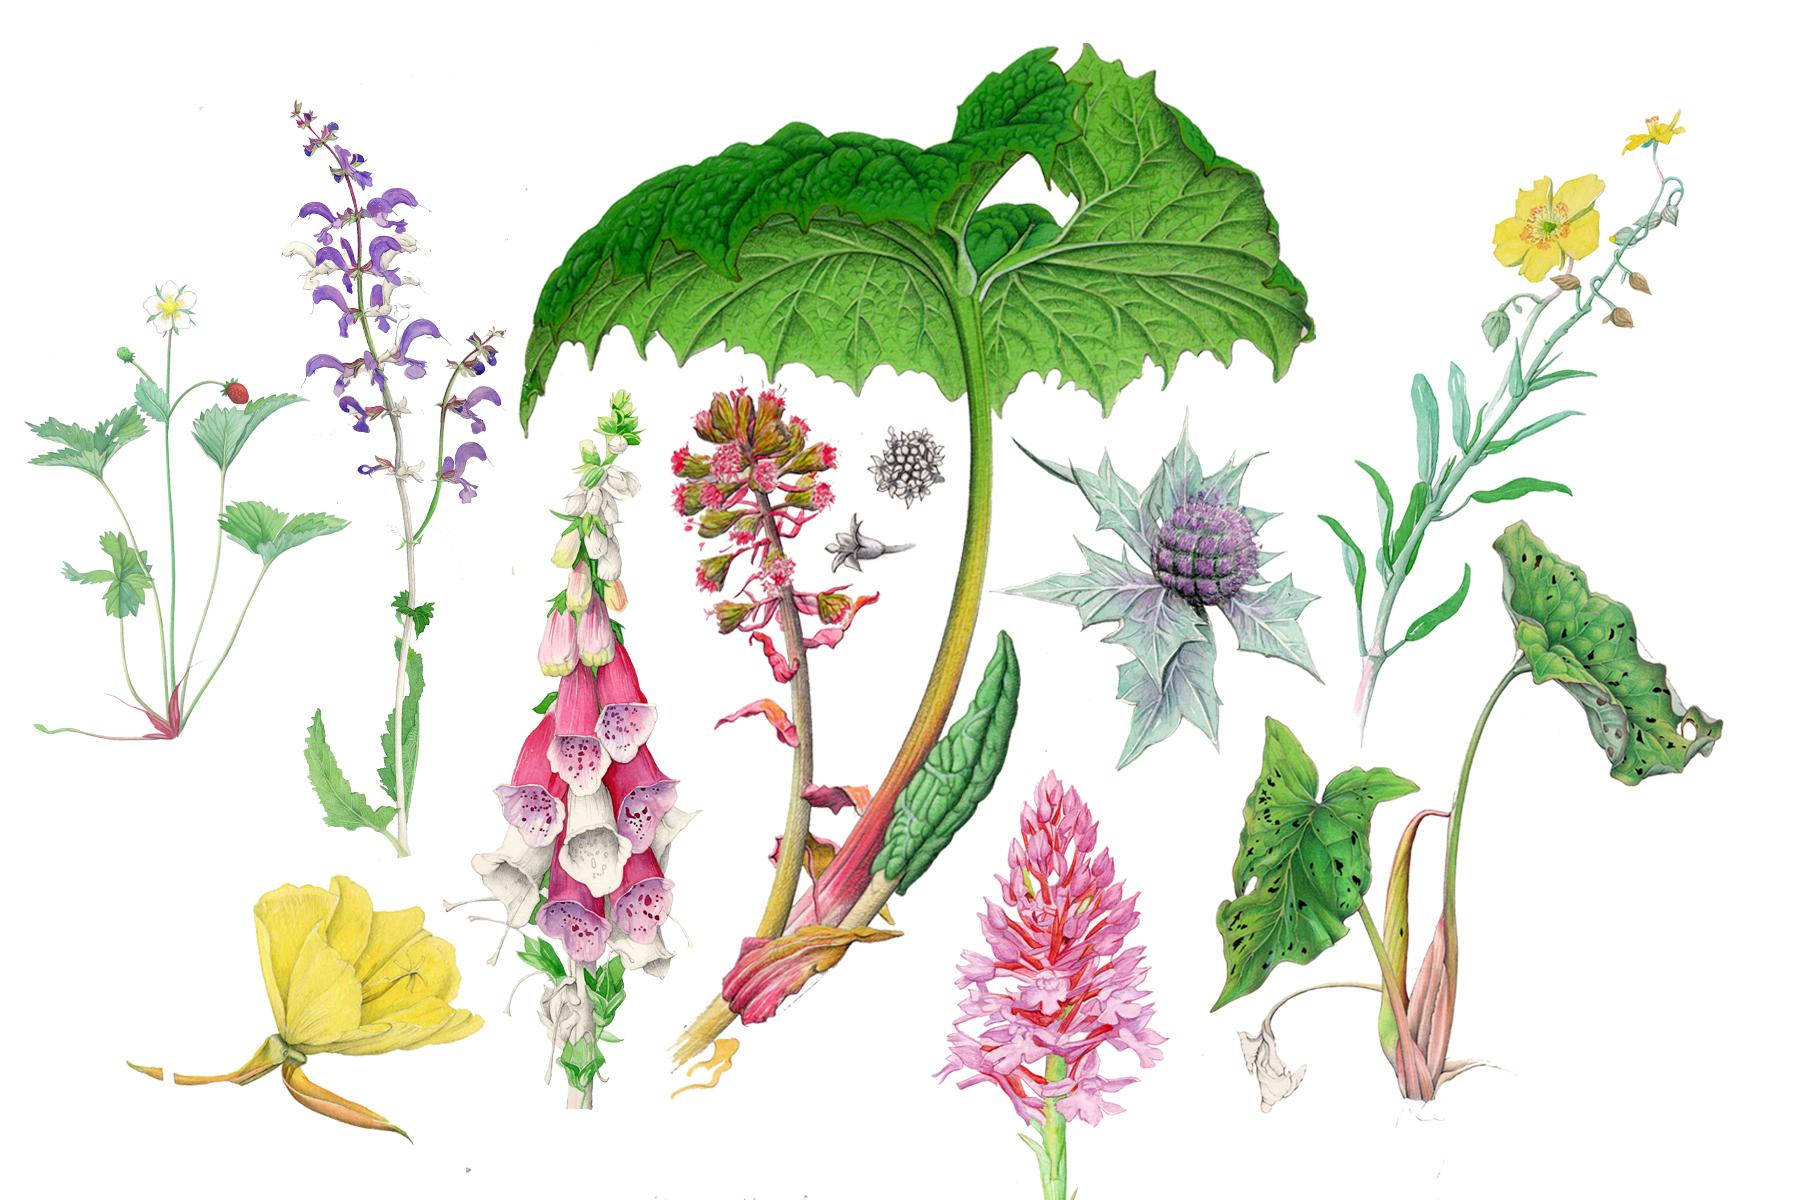 Plantes botaniques - Philippe Marle